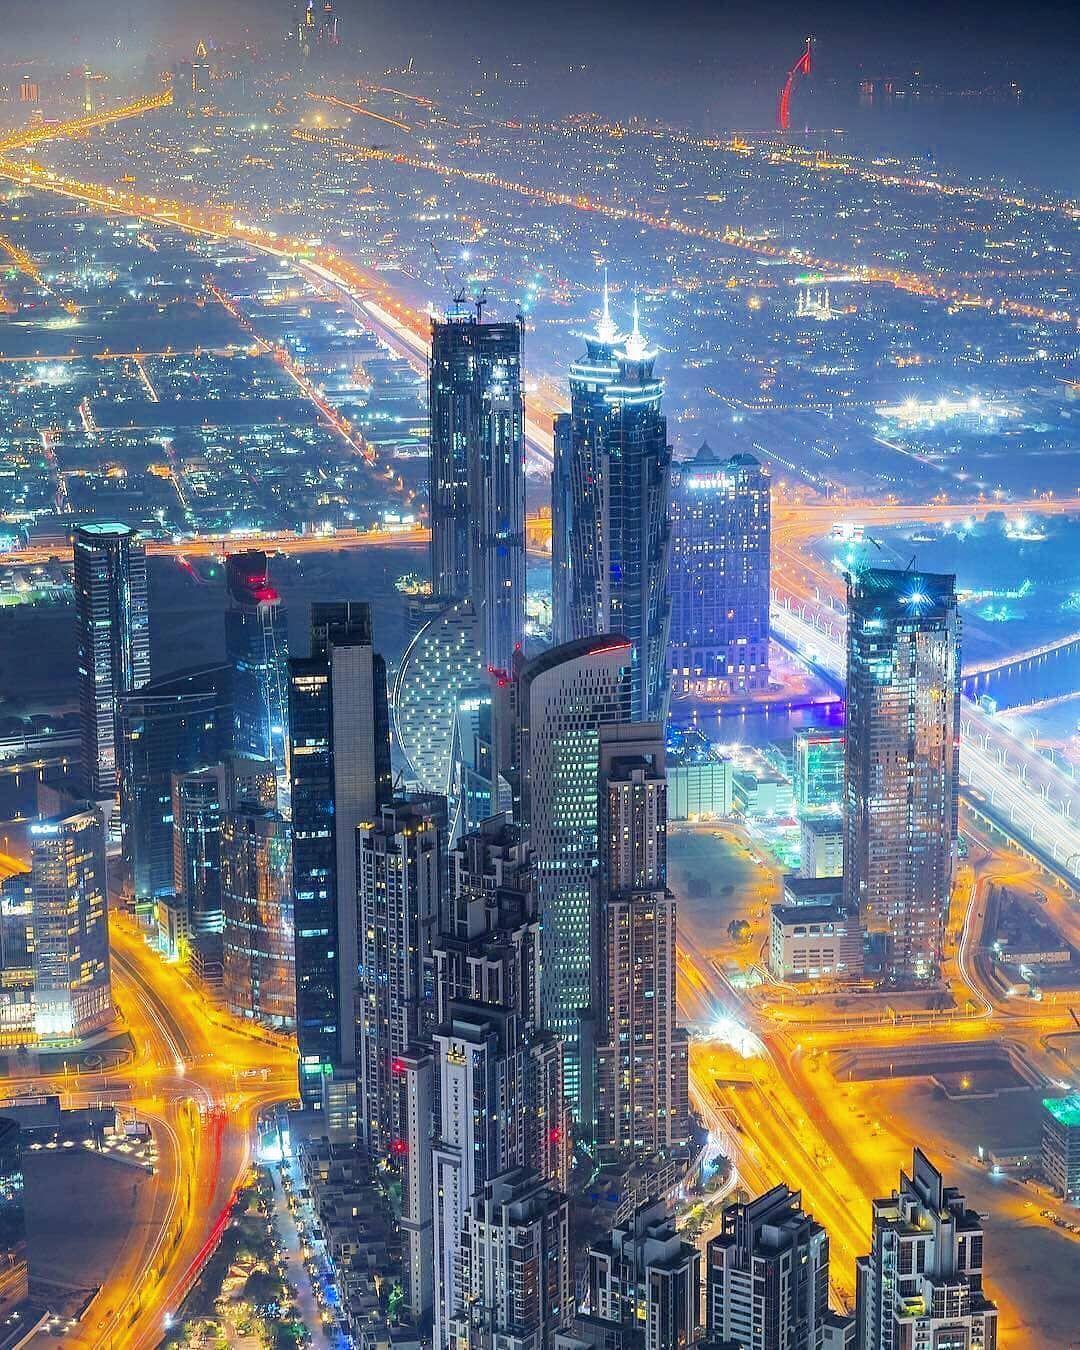 Дубай объединенные арабские эмираты фото фото квартиры дубай